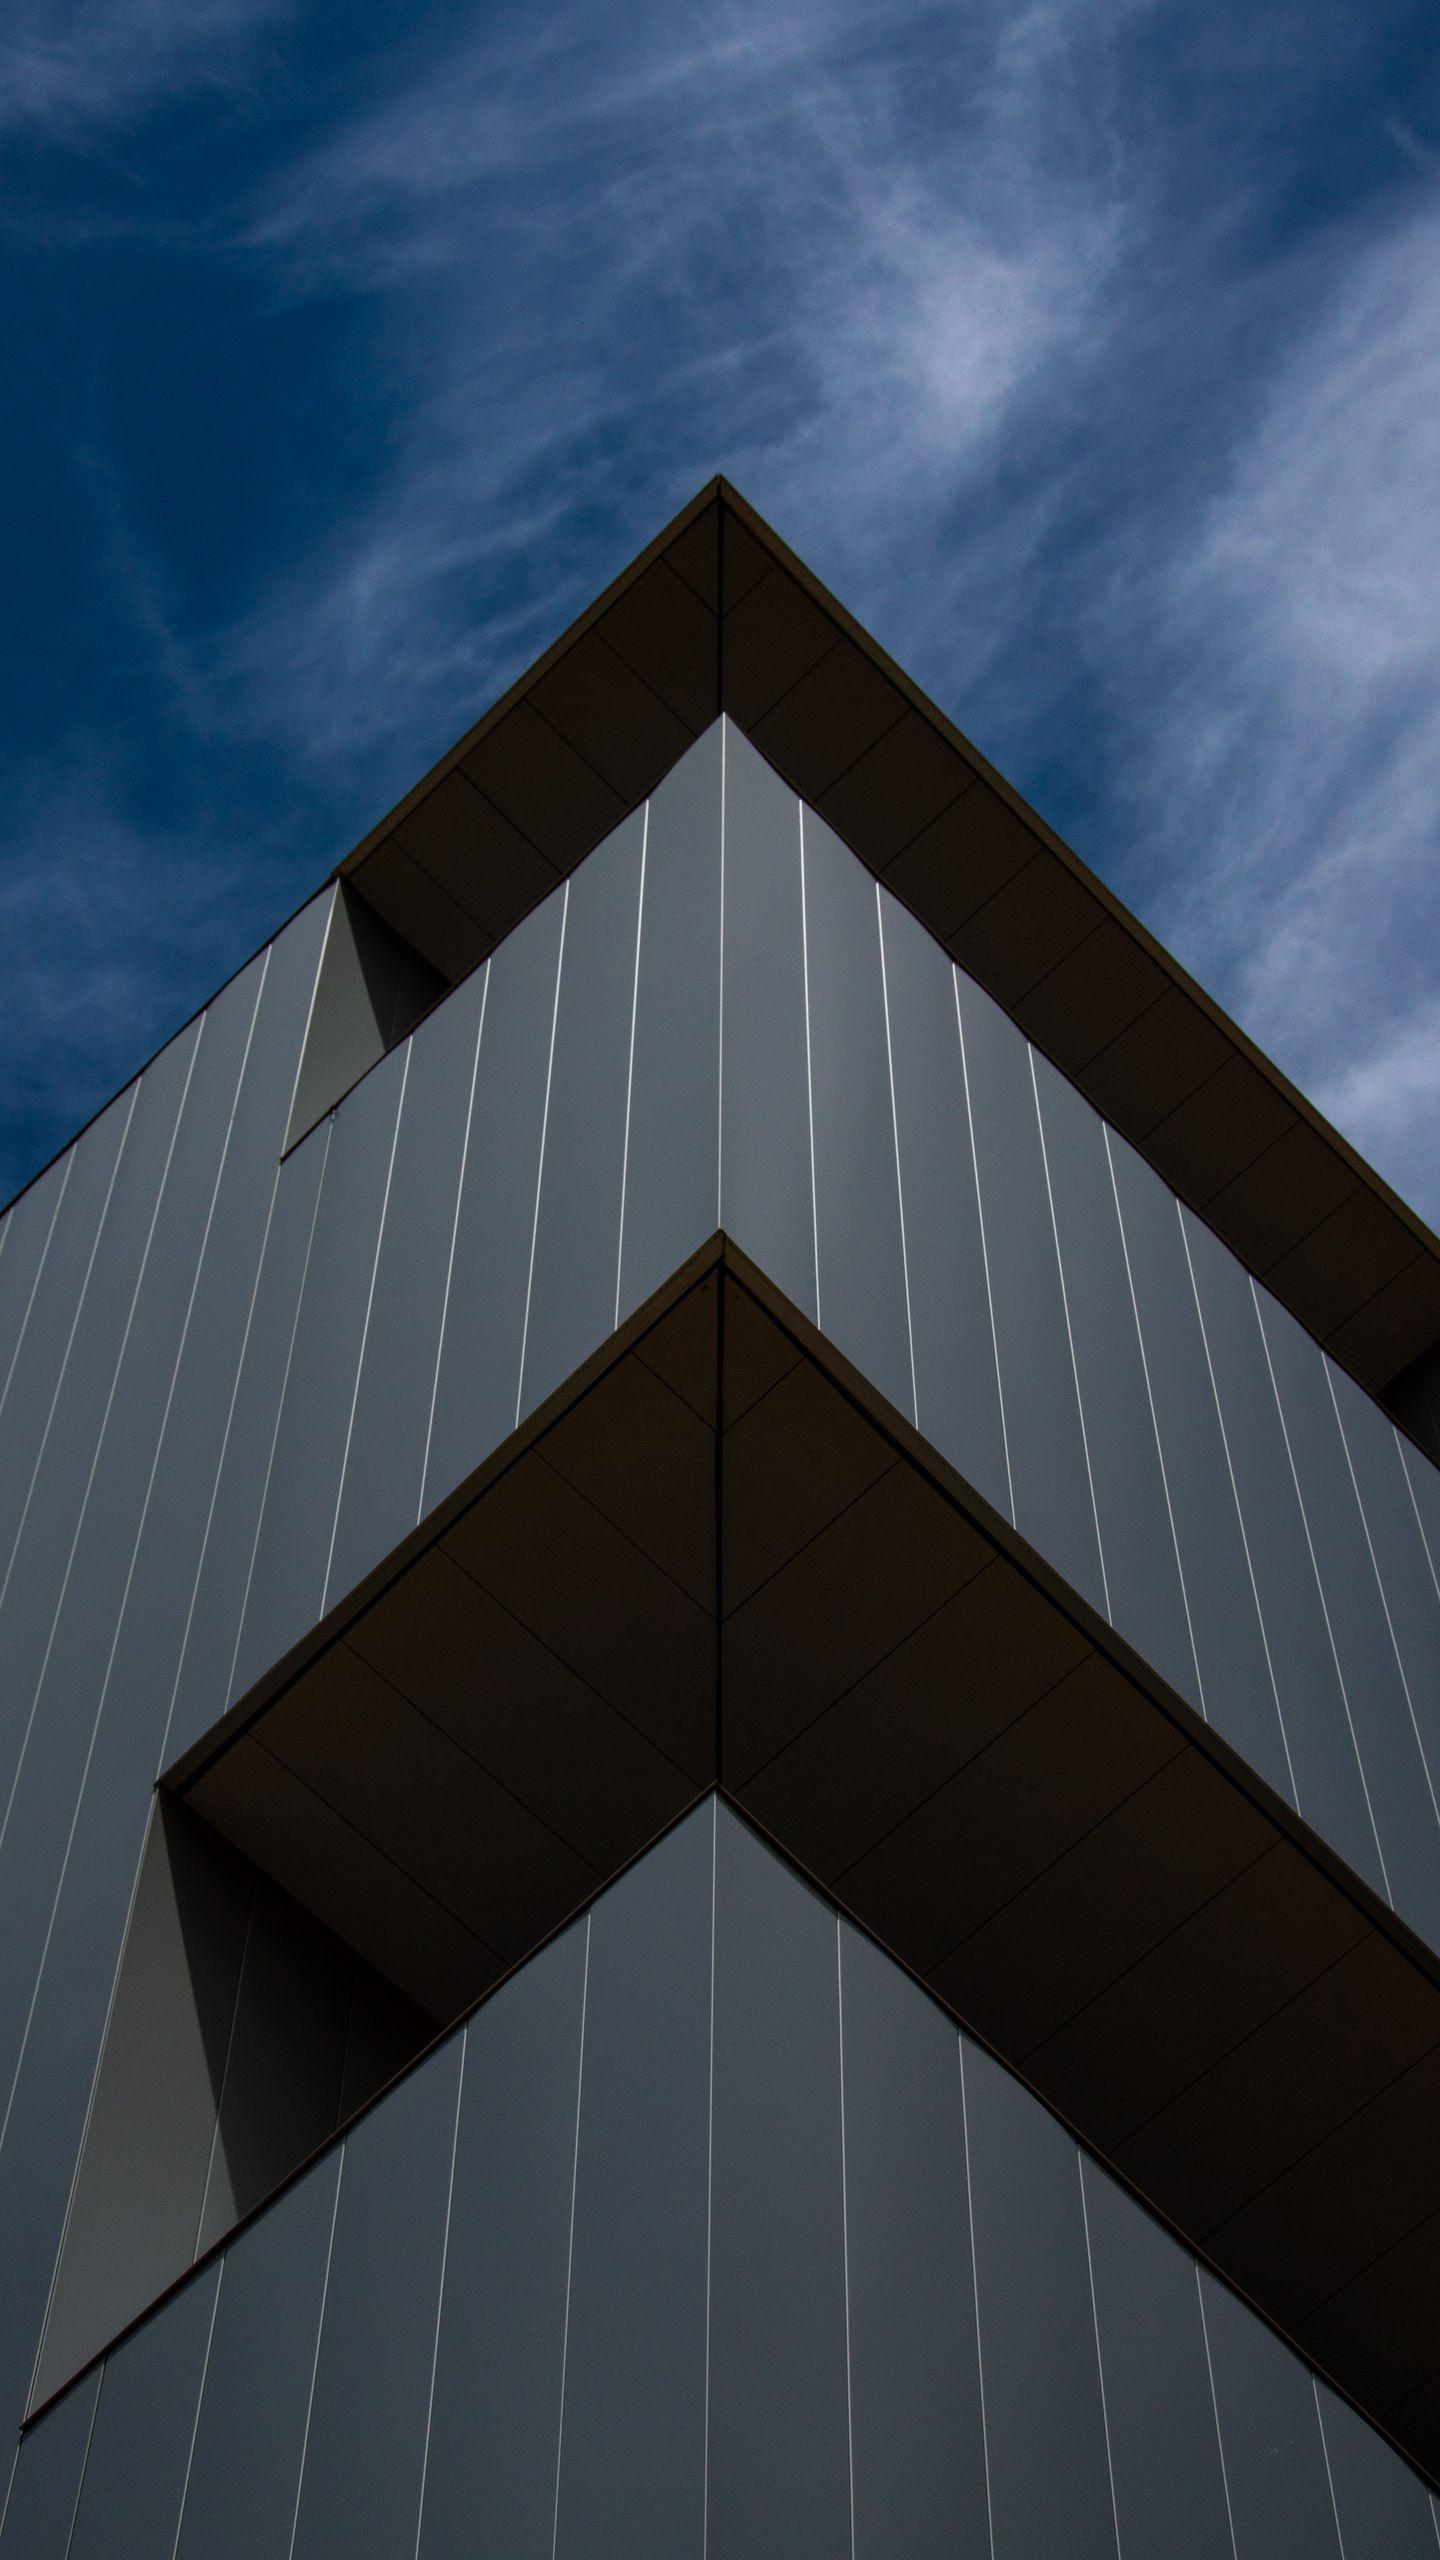 Download wallpaper 1440x2560 building architecture facade 1440x2560